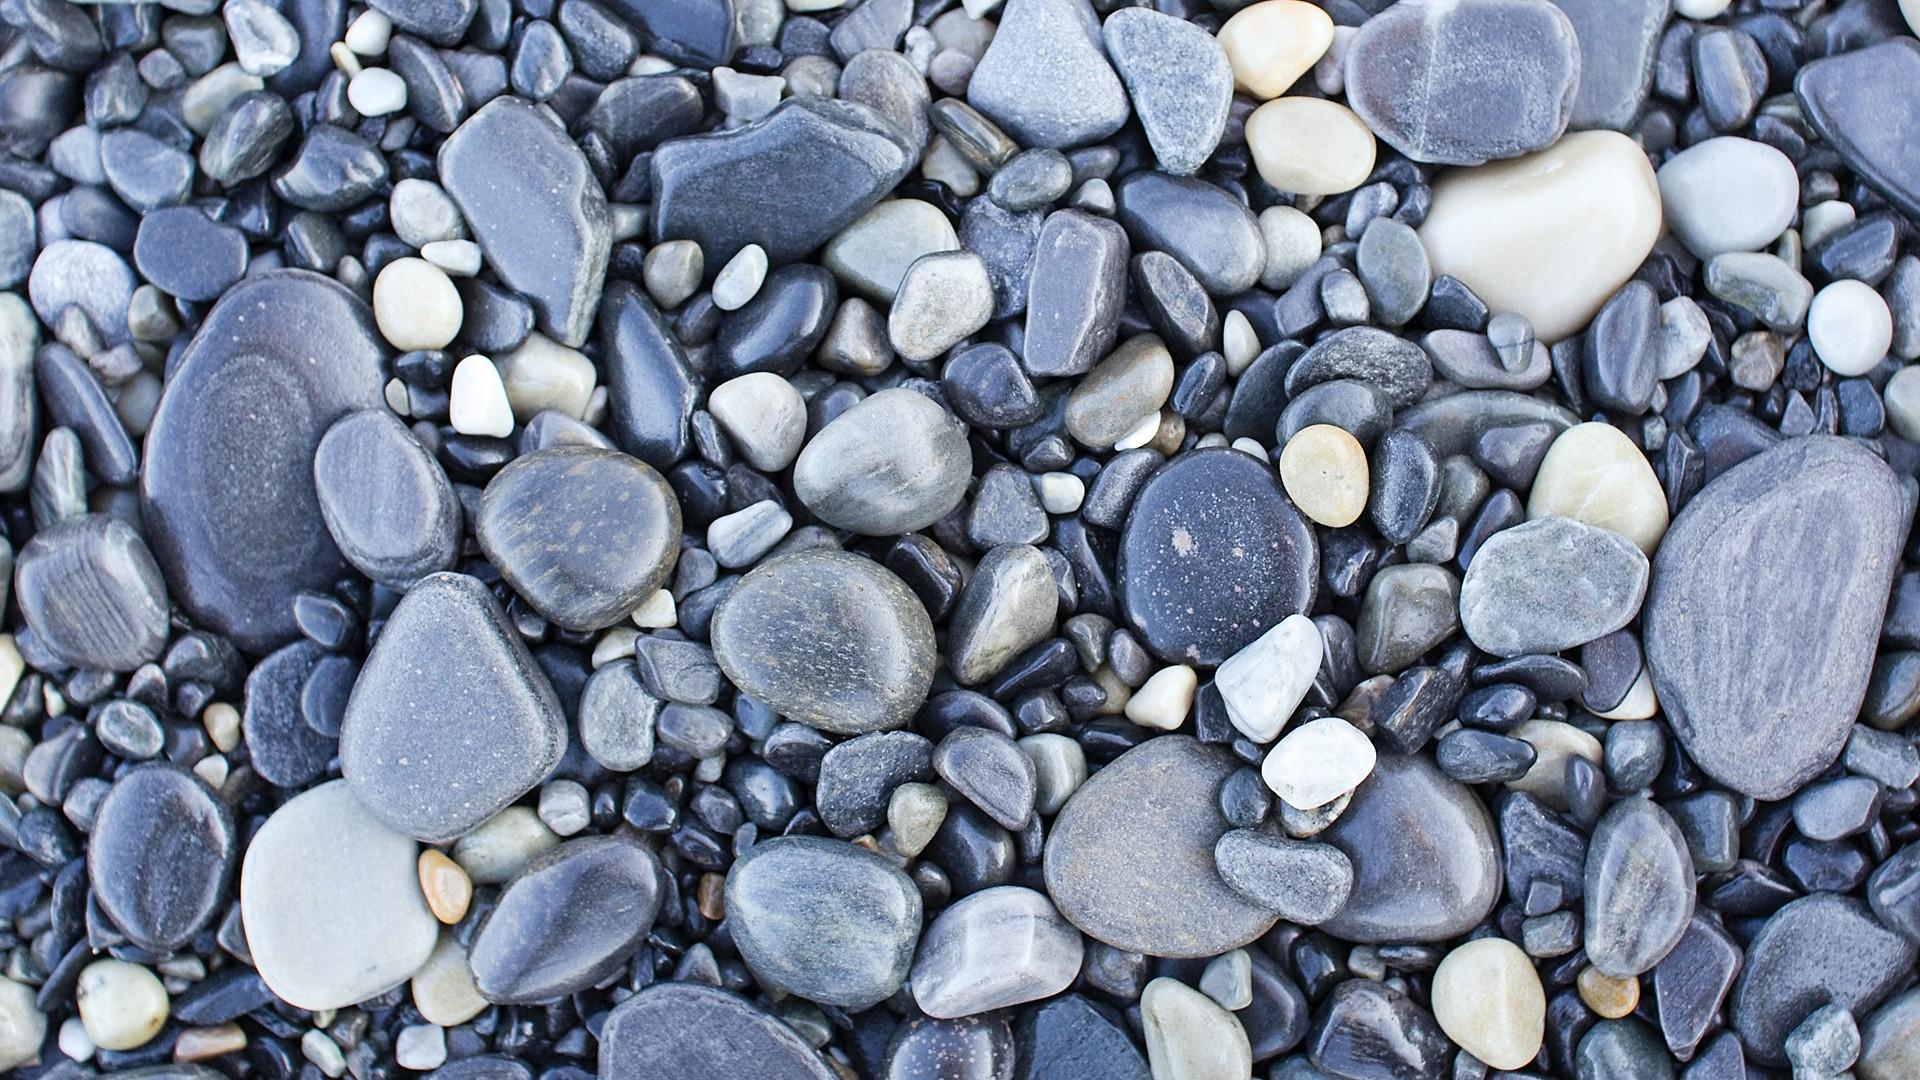 River Rocks HD Wallpaper 1920x1080